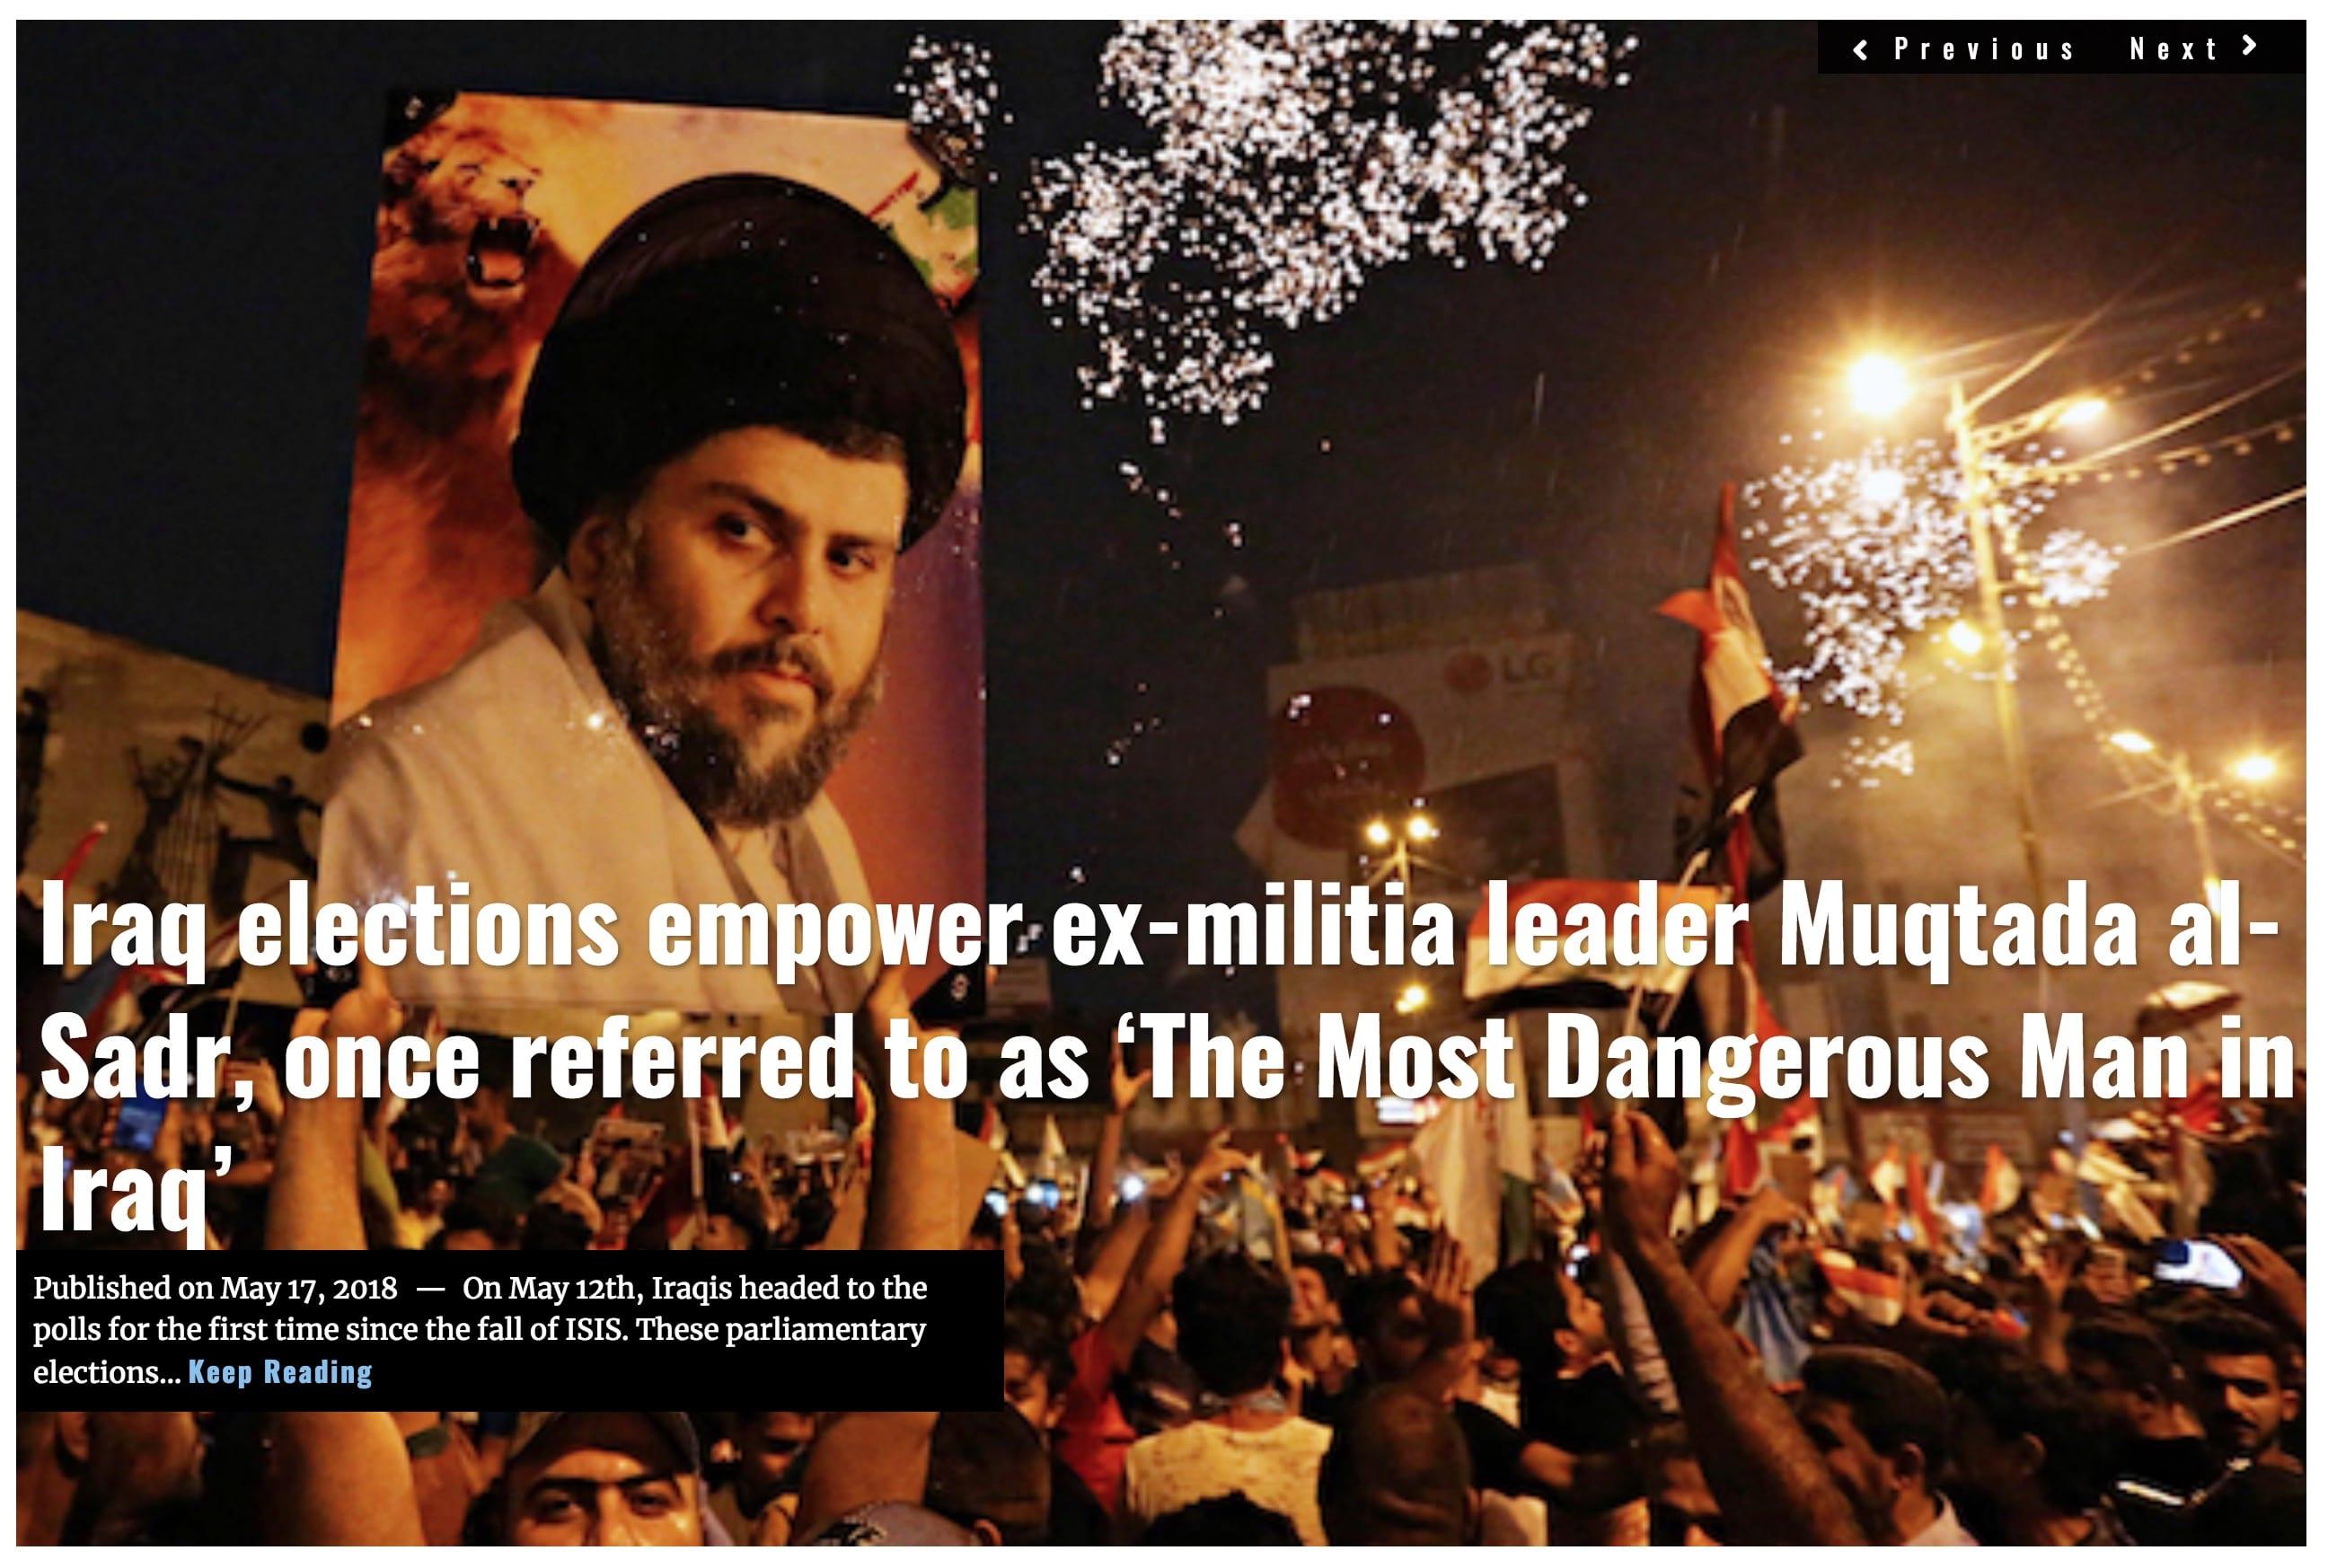 Image Lima Charlie News Headline Iraq elections al-Sadr MAY 17 2018